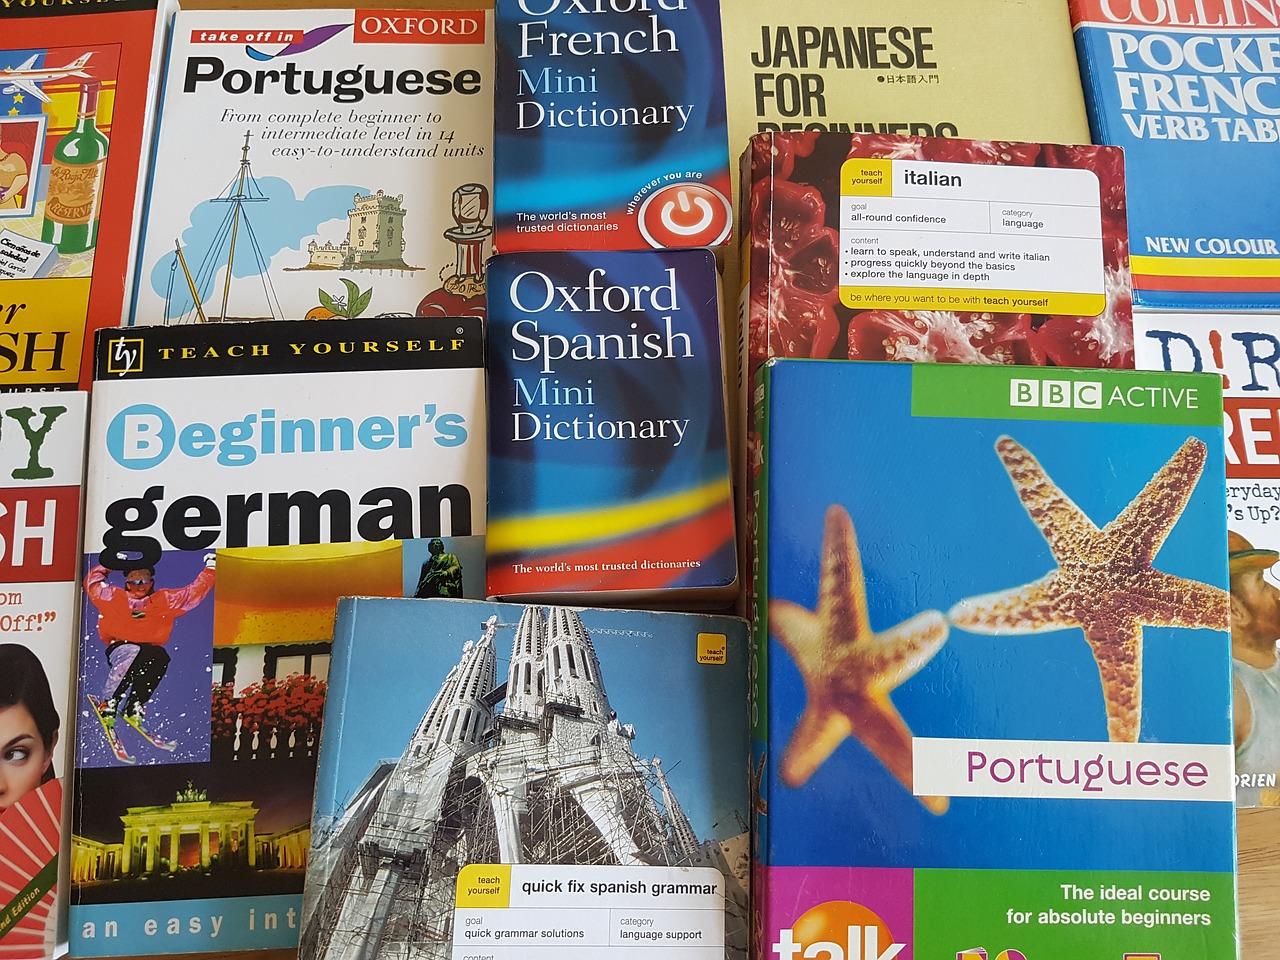 Tres maneras de traducir documentos directamente